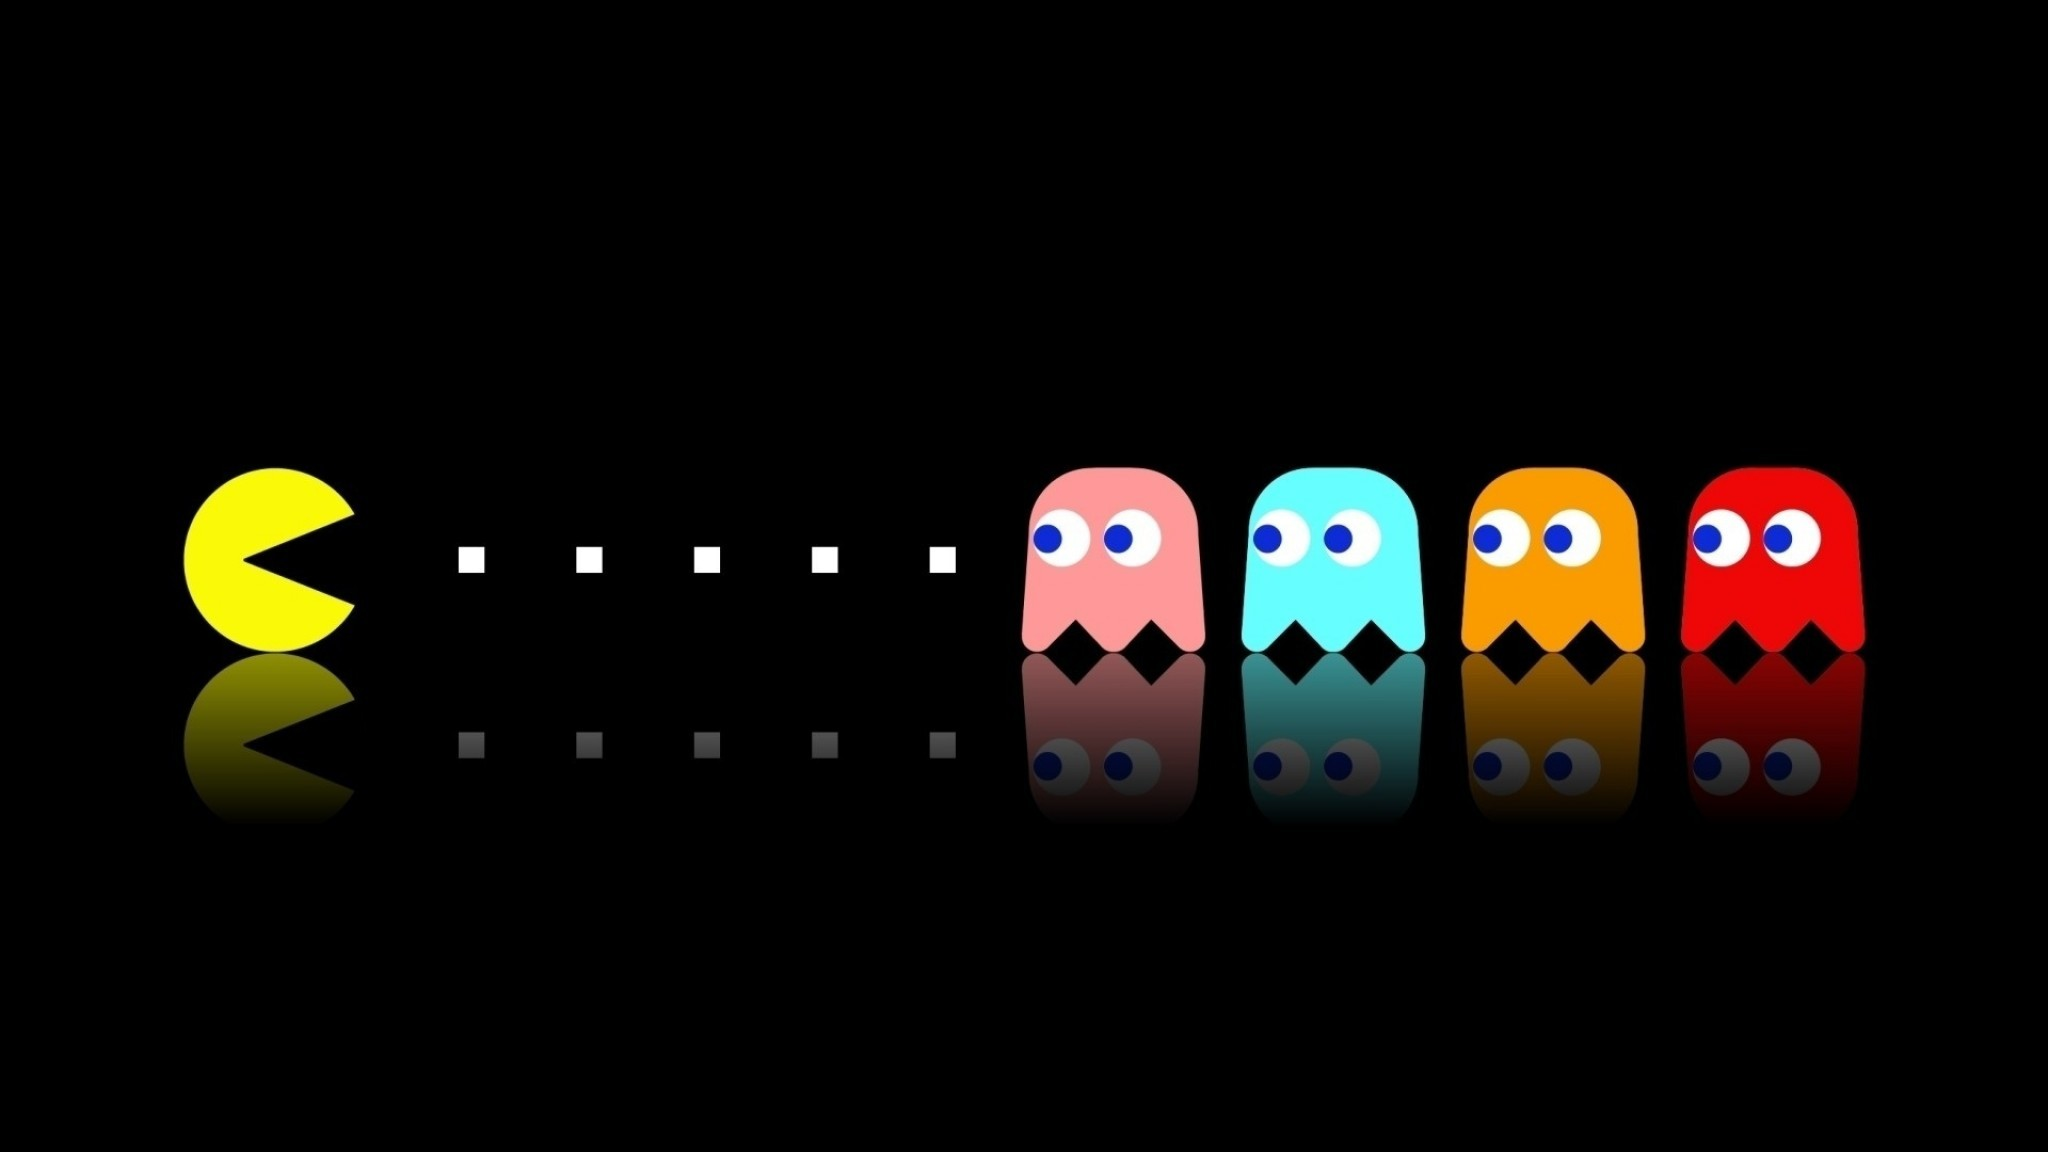 Pixels Gaming Wallpaper